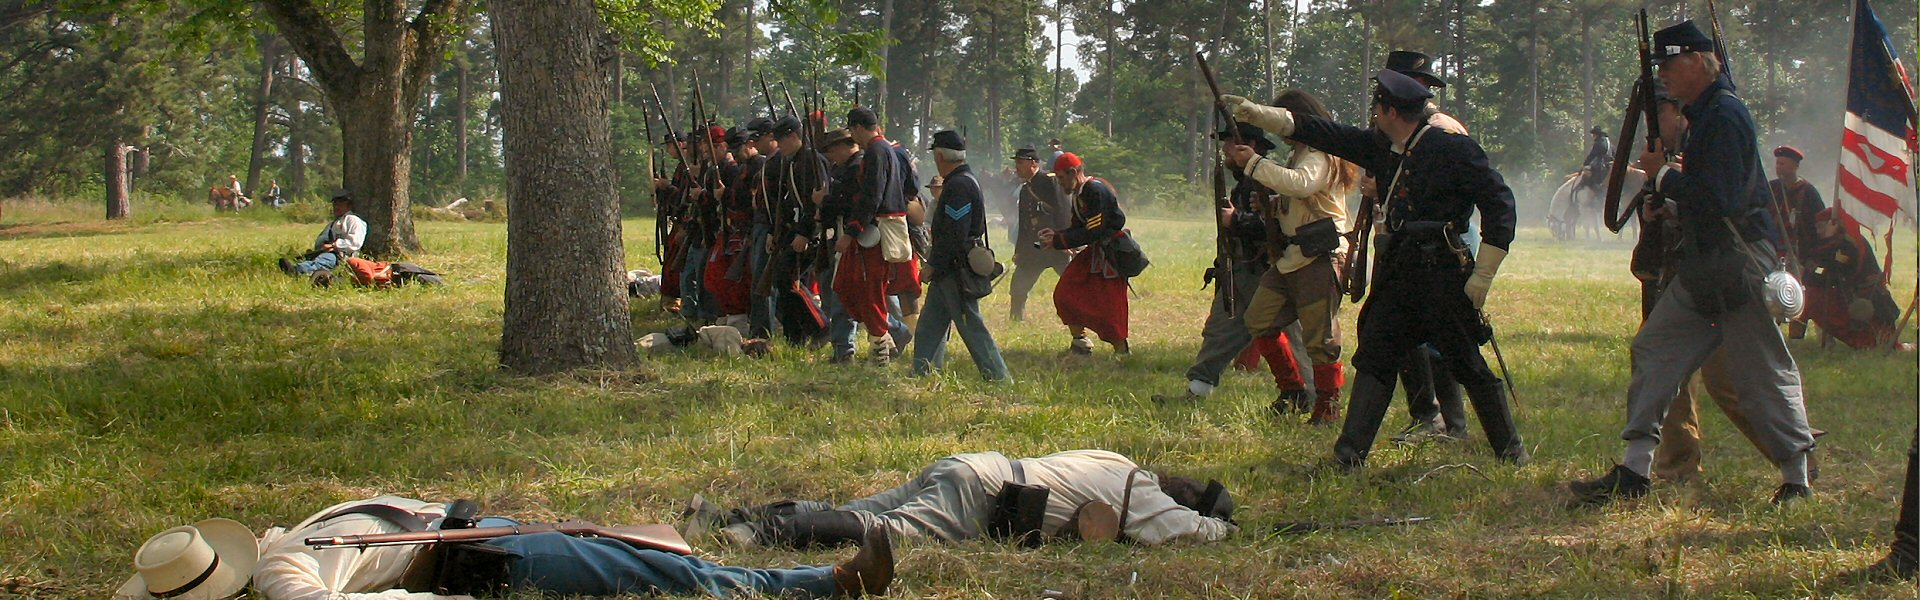 Jefferson TX Civil War Reenactment